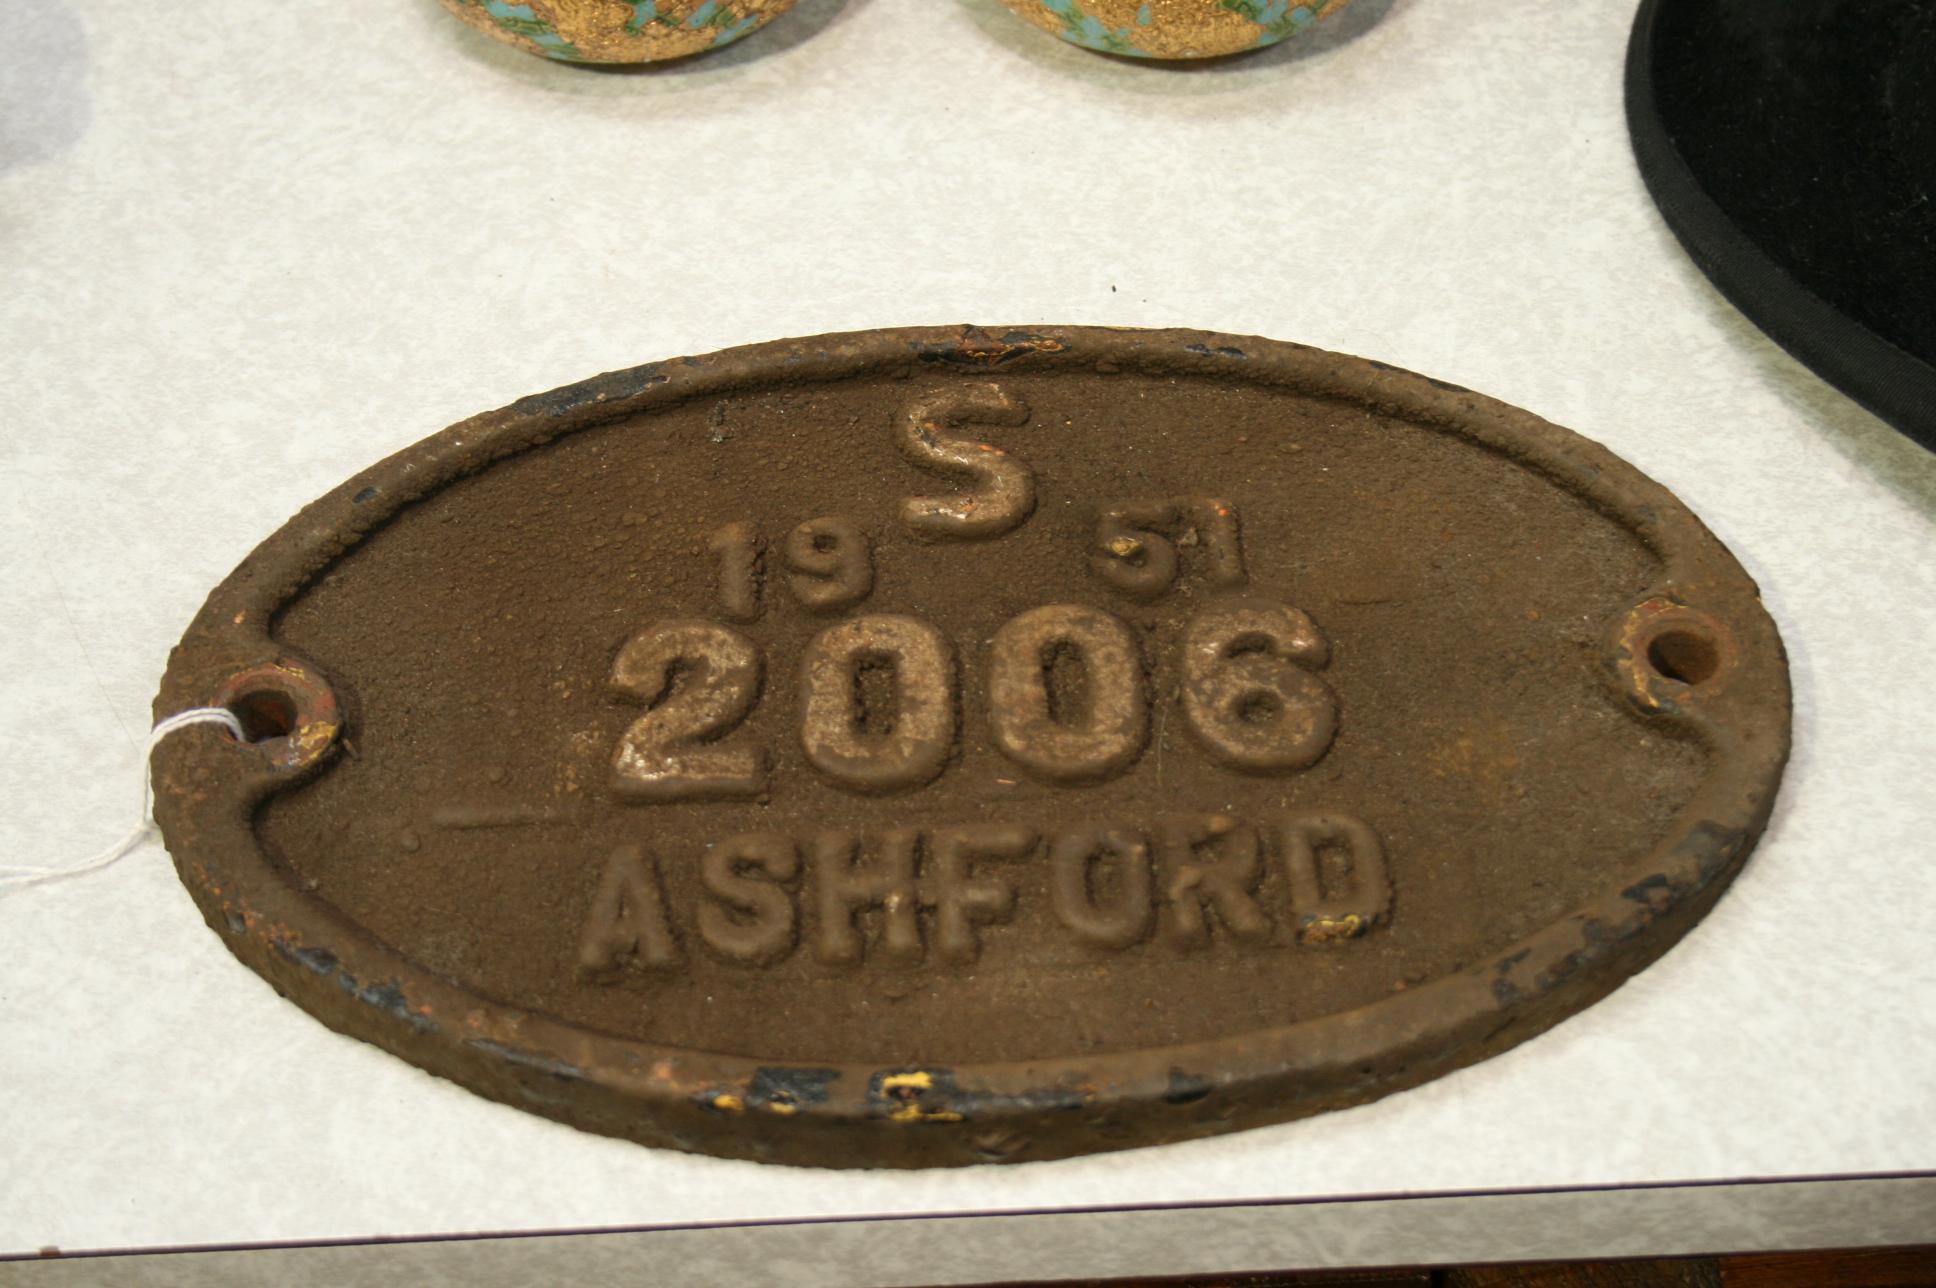 Lot 6 - 1951 Ashford Railway plate